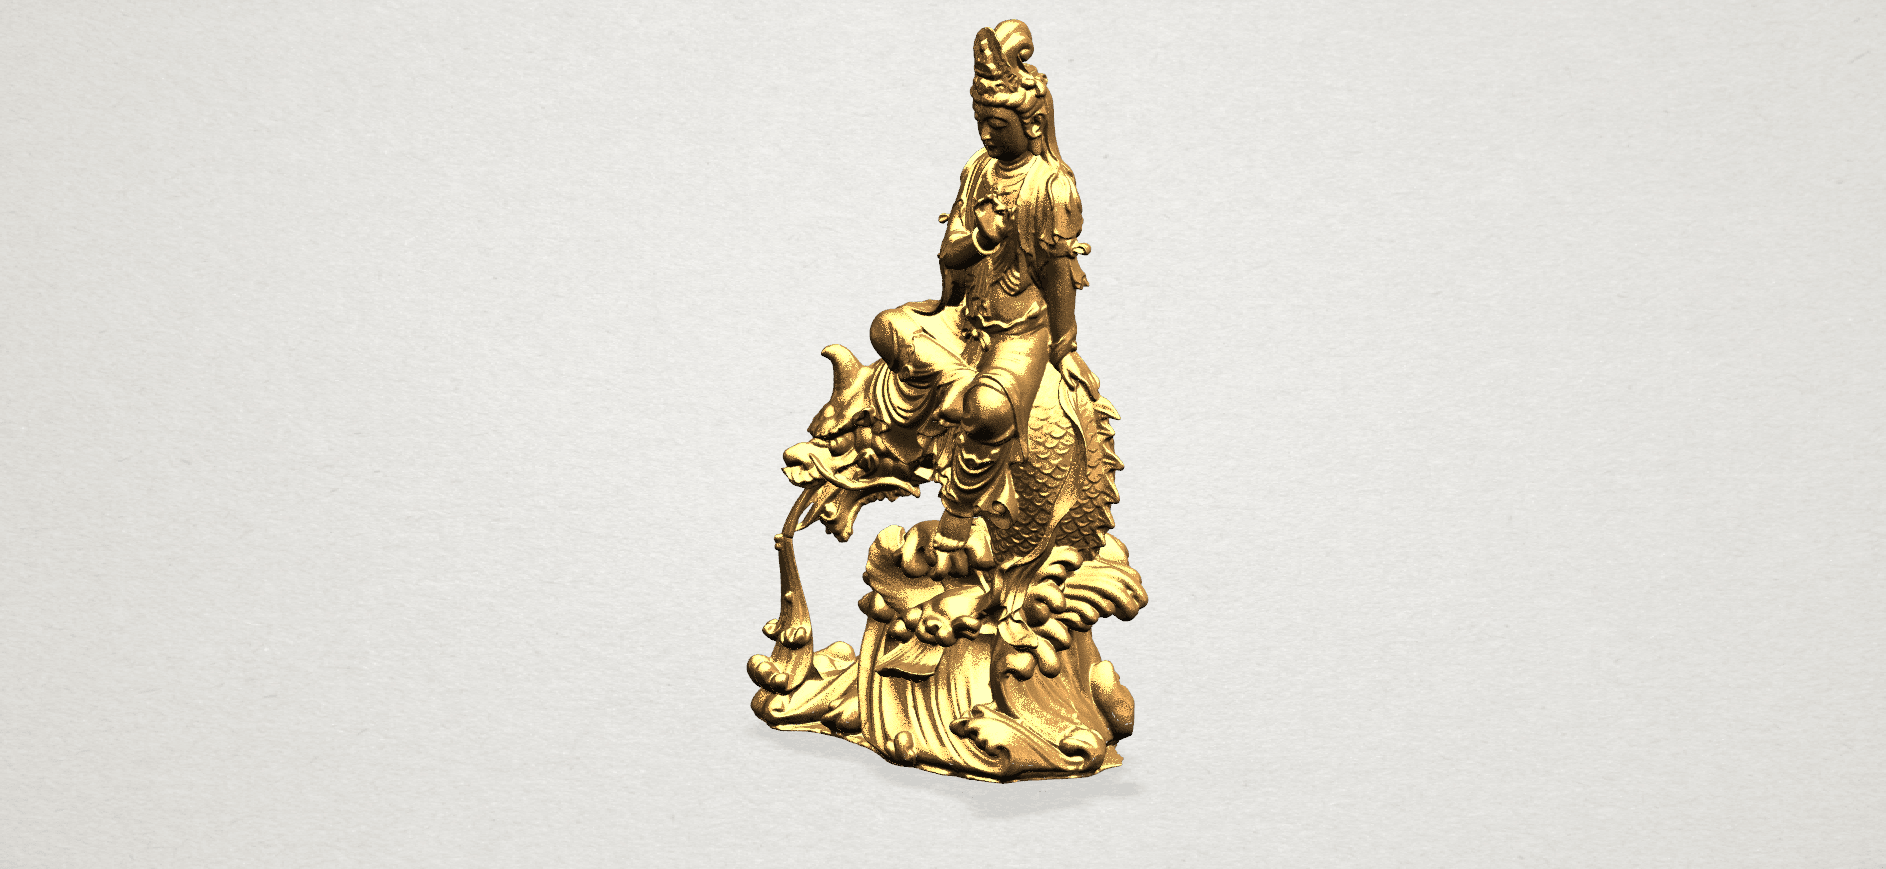 Avalokitesvara Bodhisattva (with fish) 88mm - A09.png Télécharger fichier 3DS gratuit Avalokitesvara Bodhisattva (avec poisson) 01 • Modèle imprimable en 3D, GeorgesNikkei